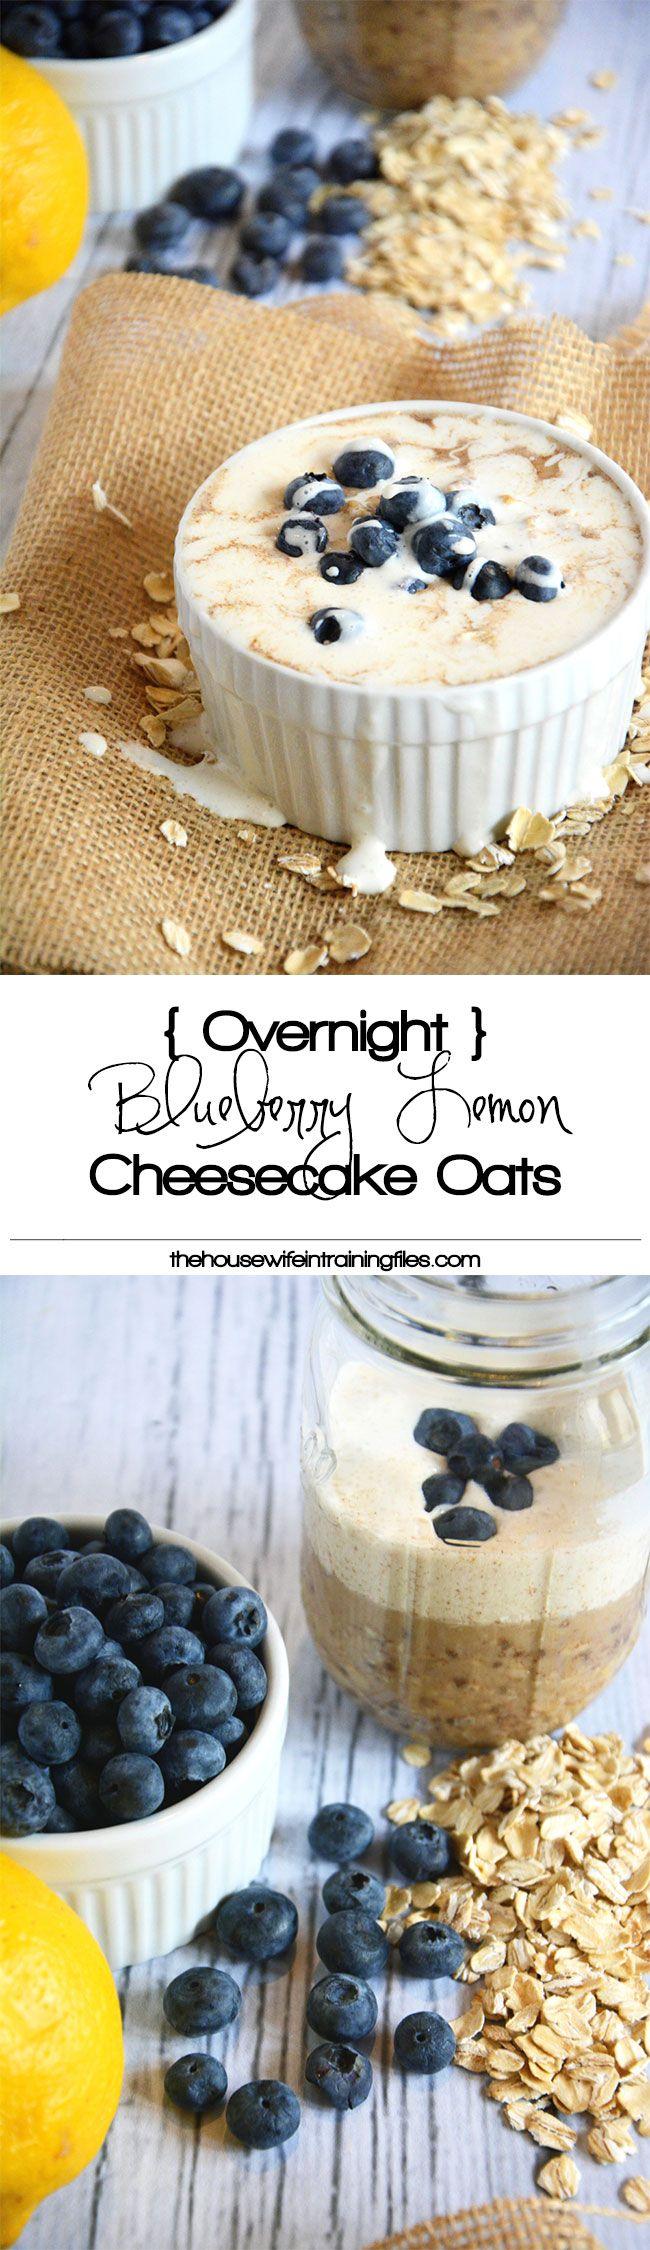 Overnight Blueberry Lemon Cheesecake Oats